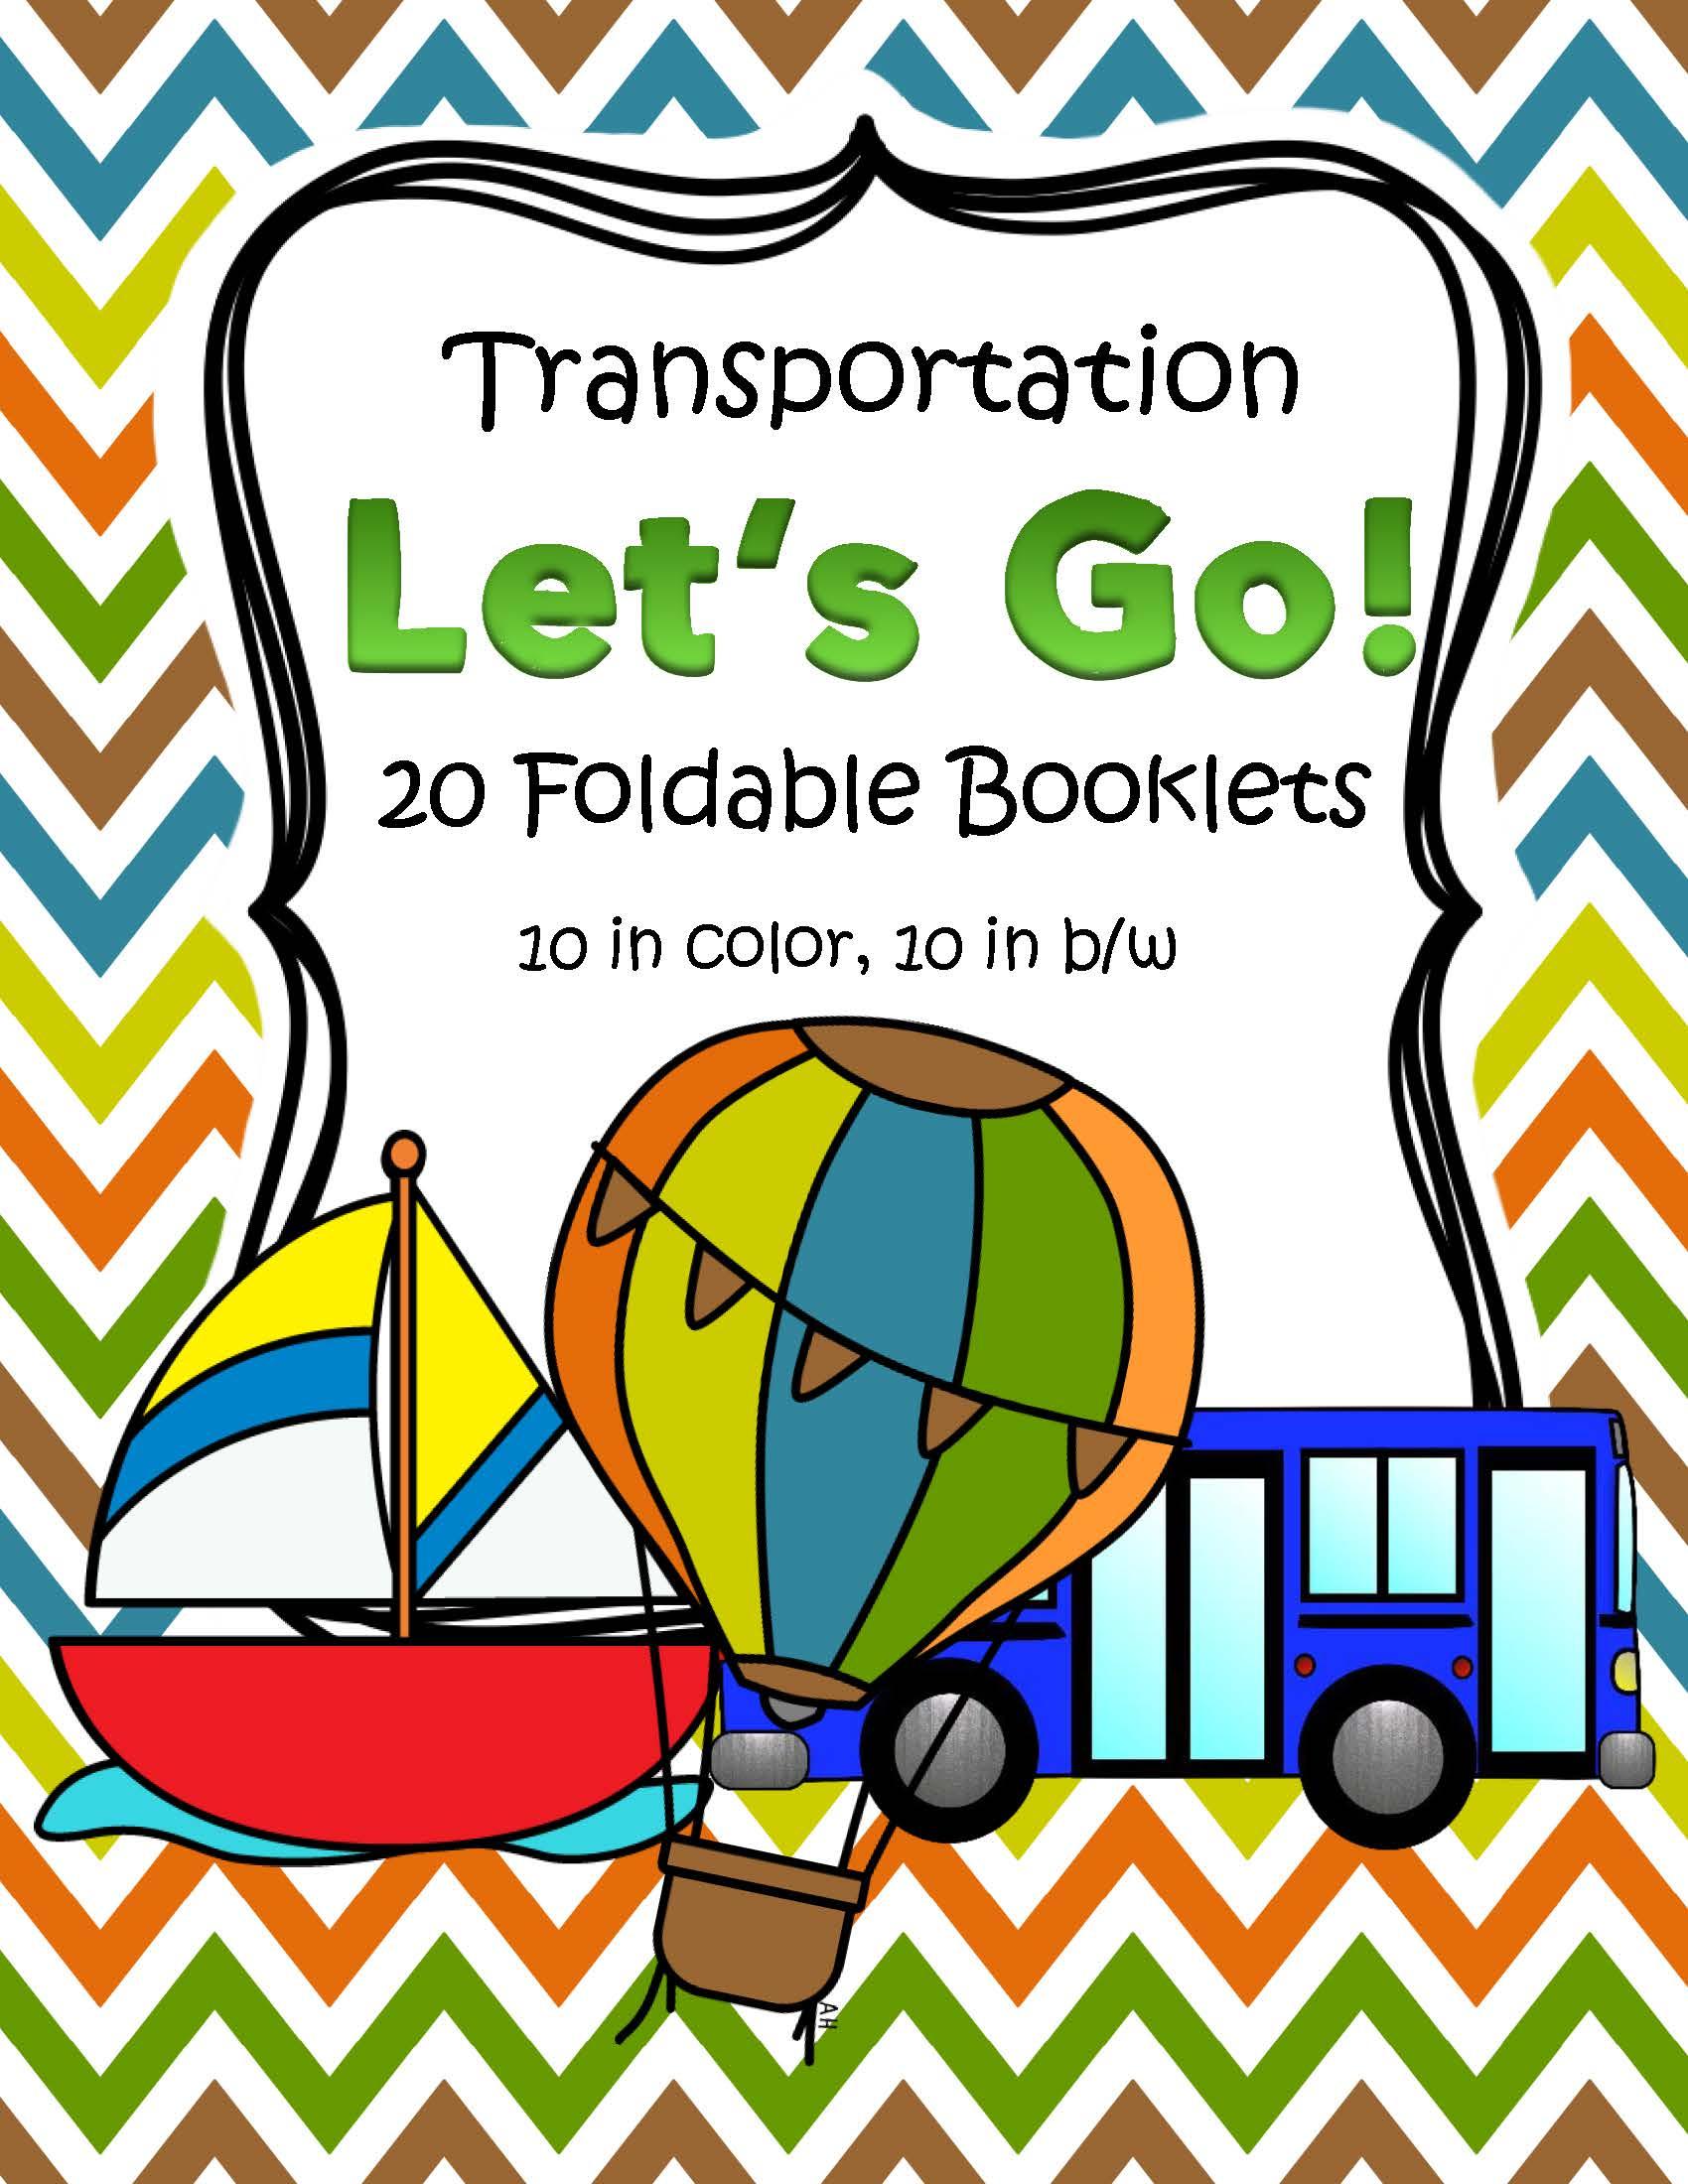 Transportation Foldable Booklets